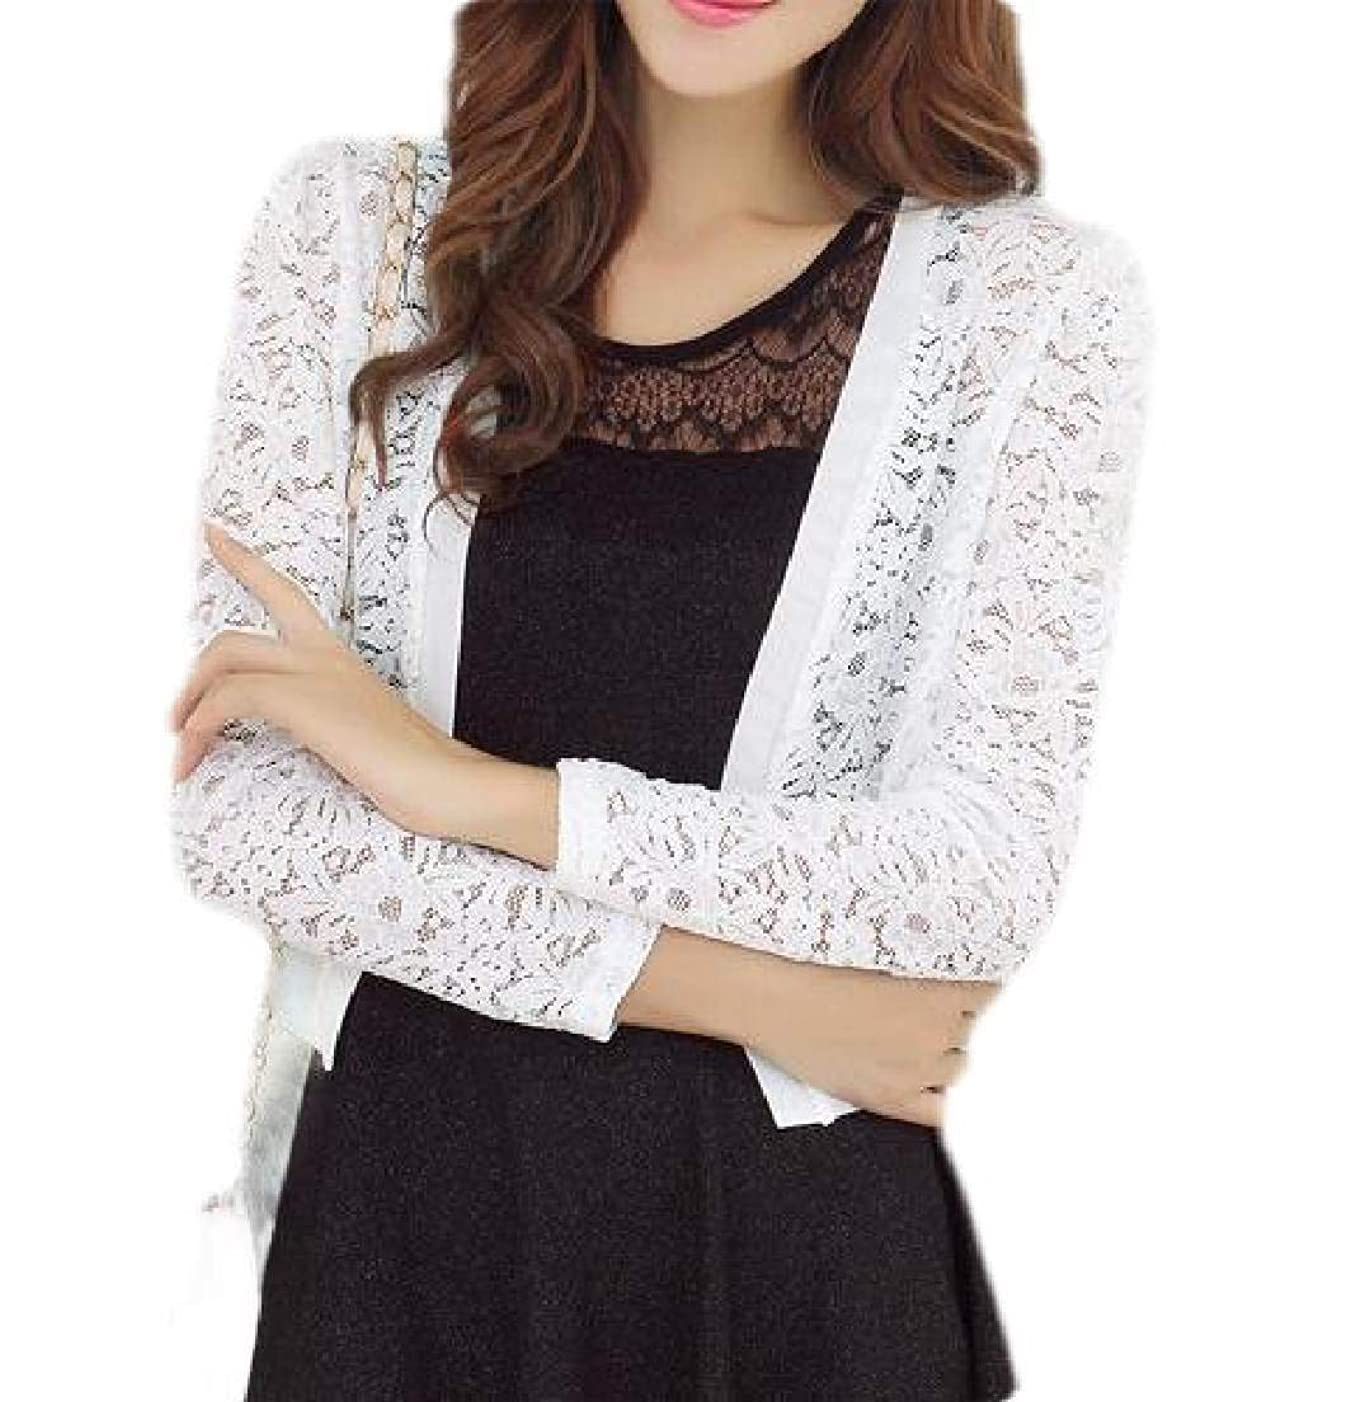 X-Future Women Crochet Lace Short Sleeve Bolero Shrug Cardigan Jacket